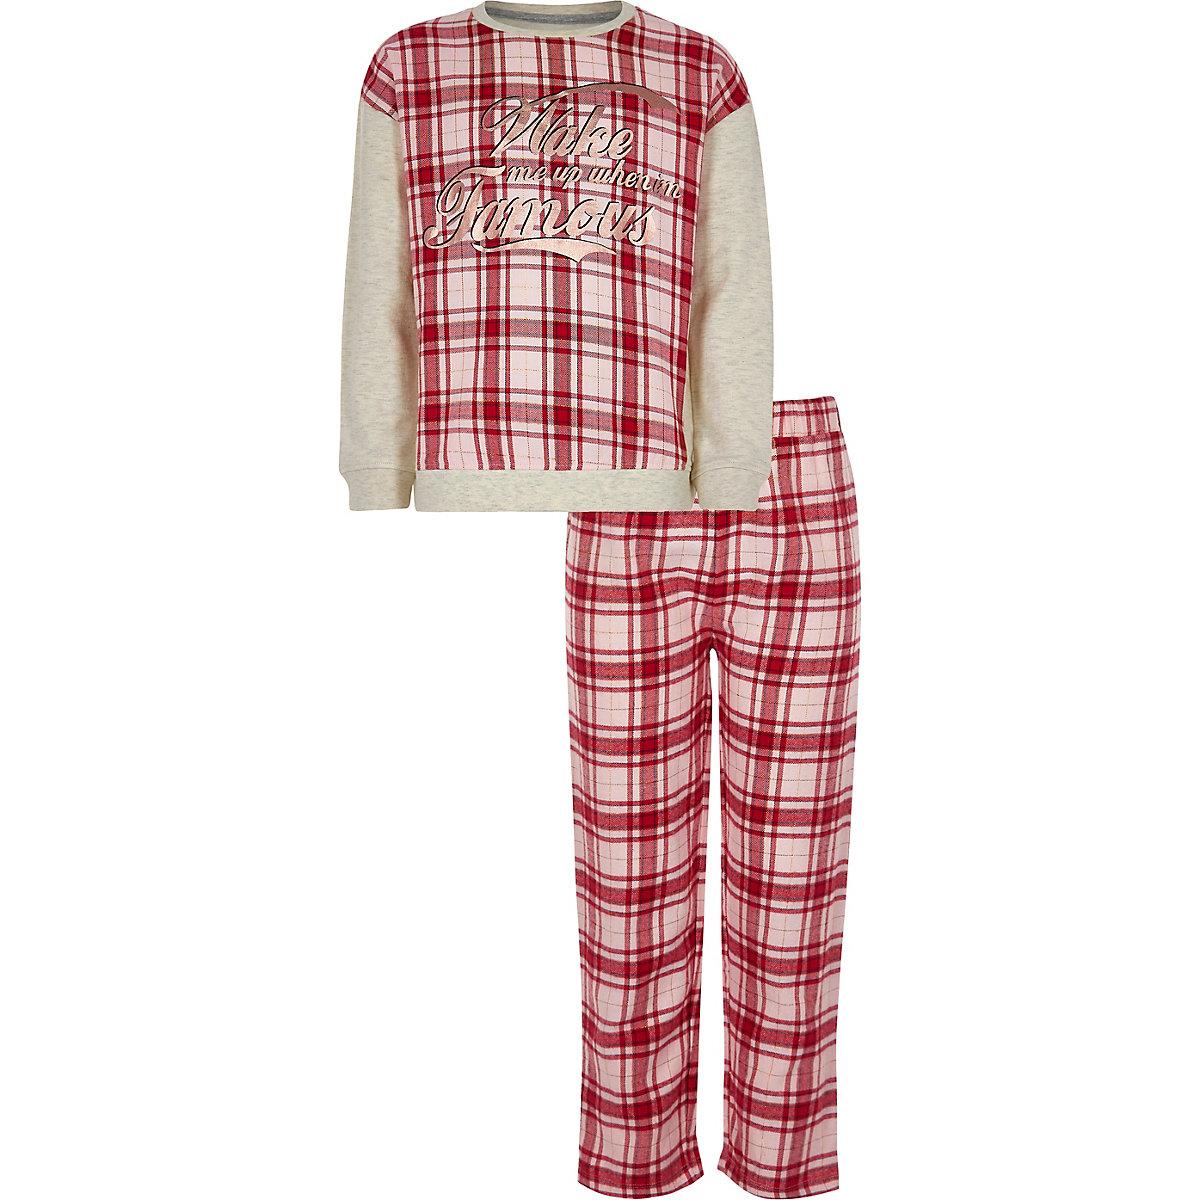 Girls red 'wake me up' check pyjama set